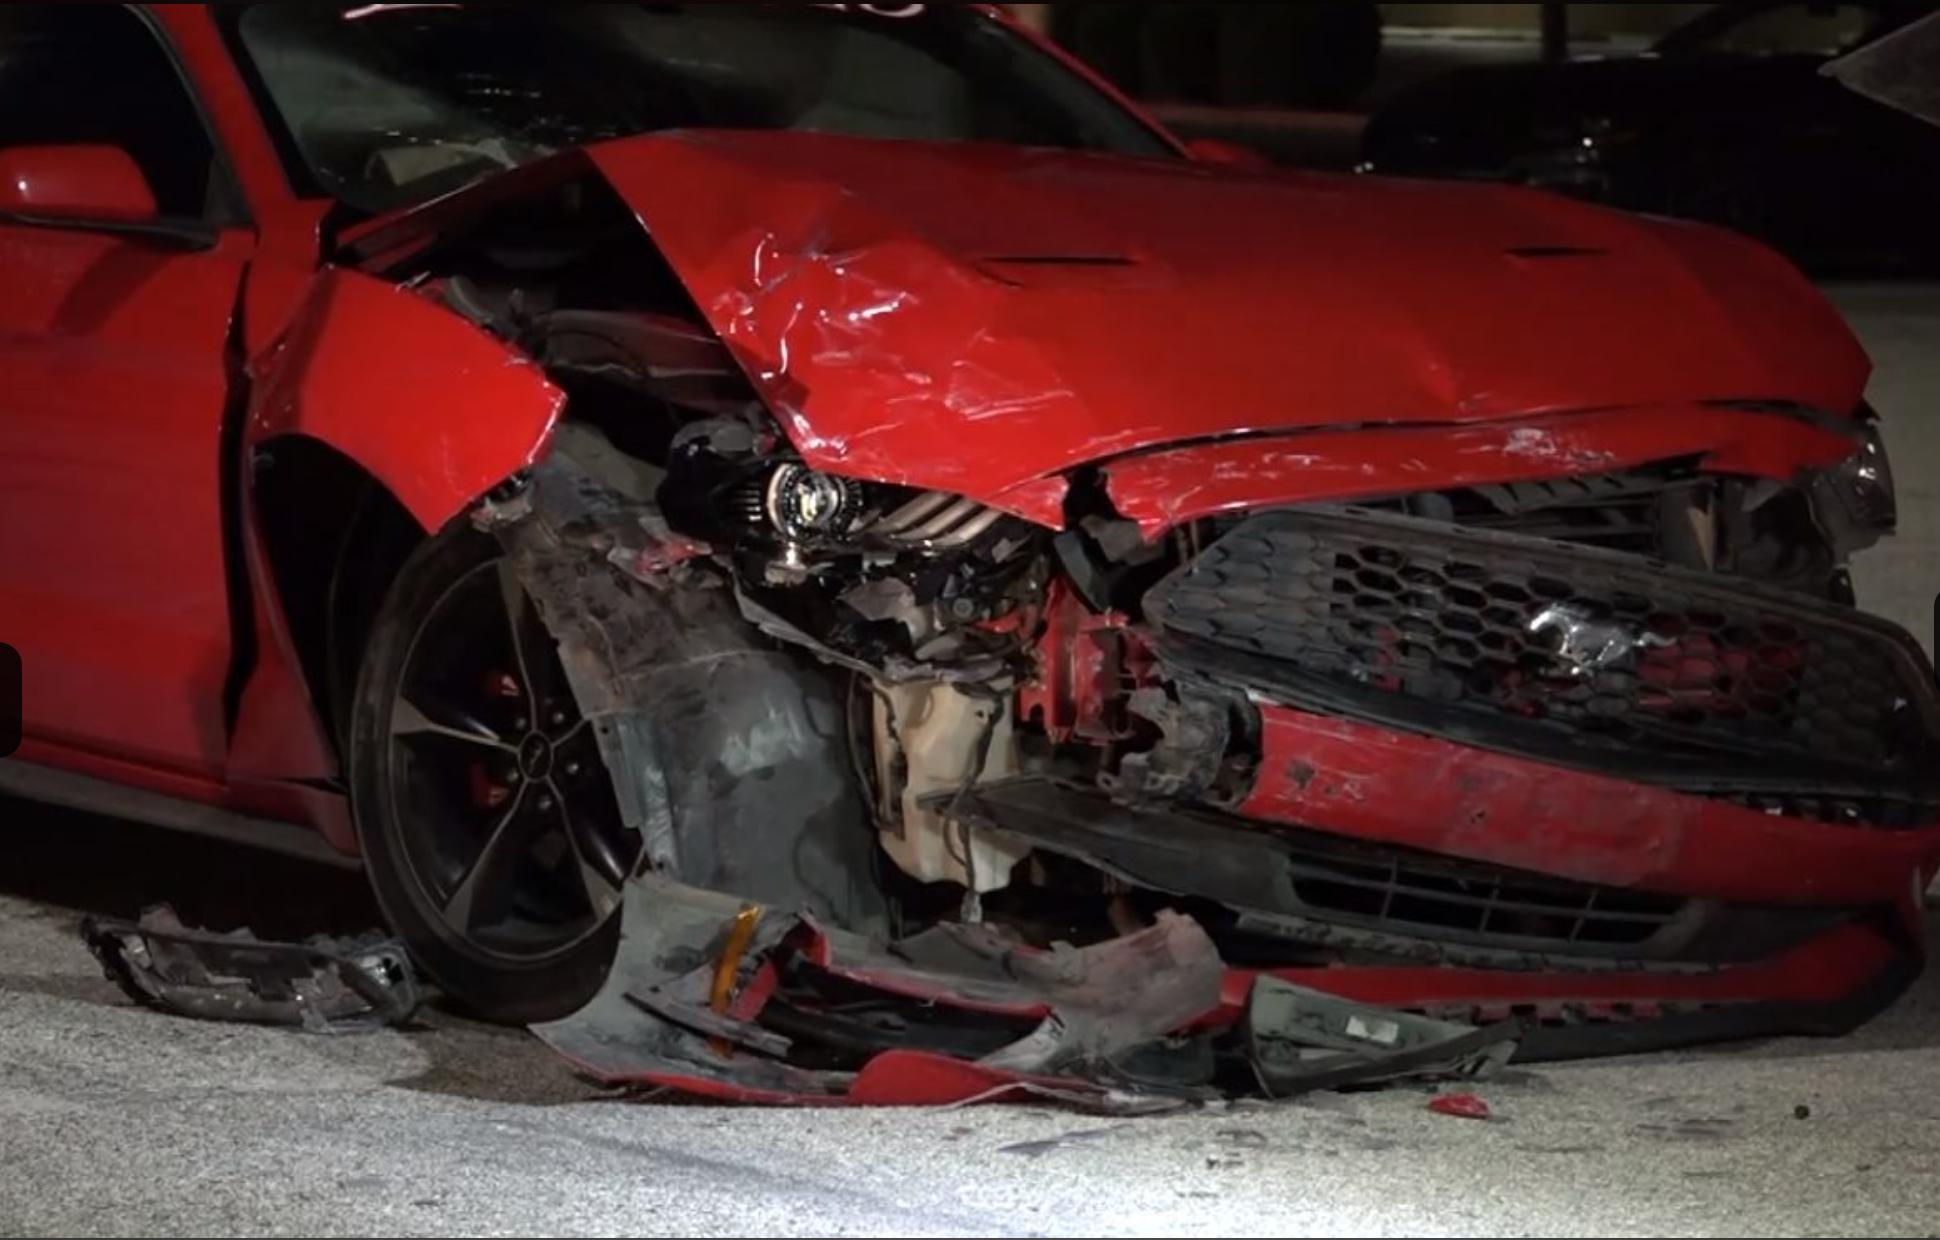 "<img src=""donuts-mustang-crash.png"" alt=""A crashed Mustang after parking lot donuts"">"